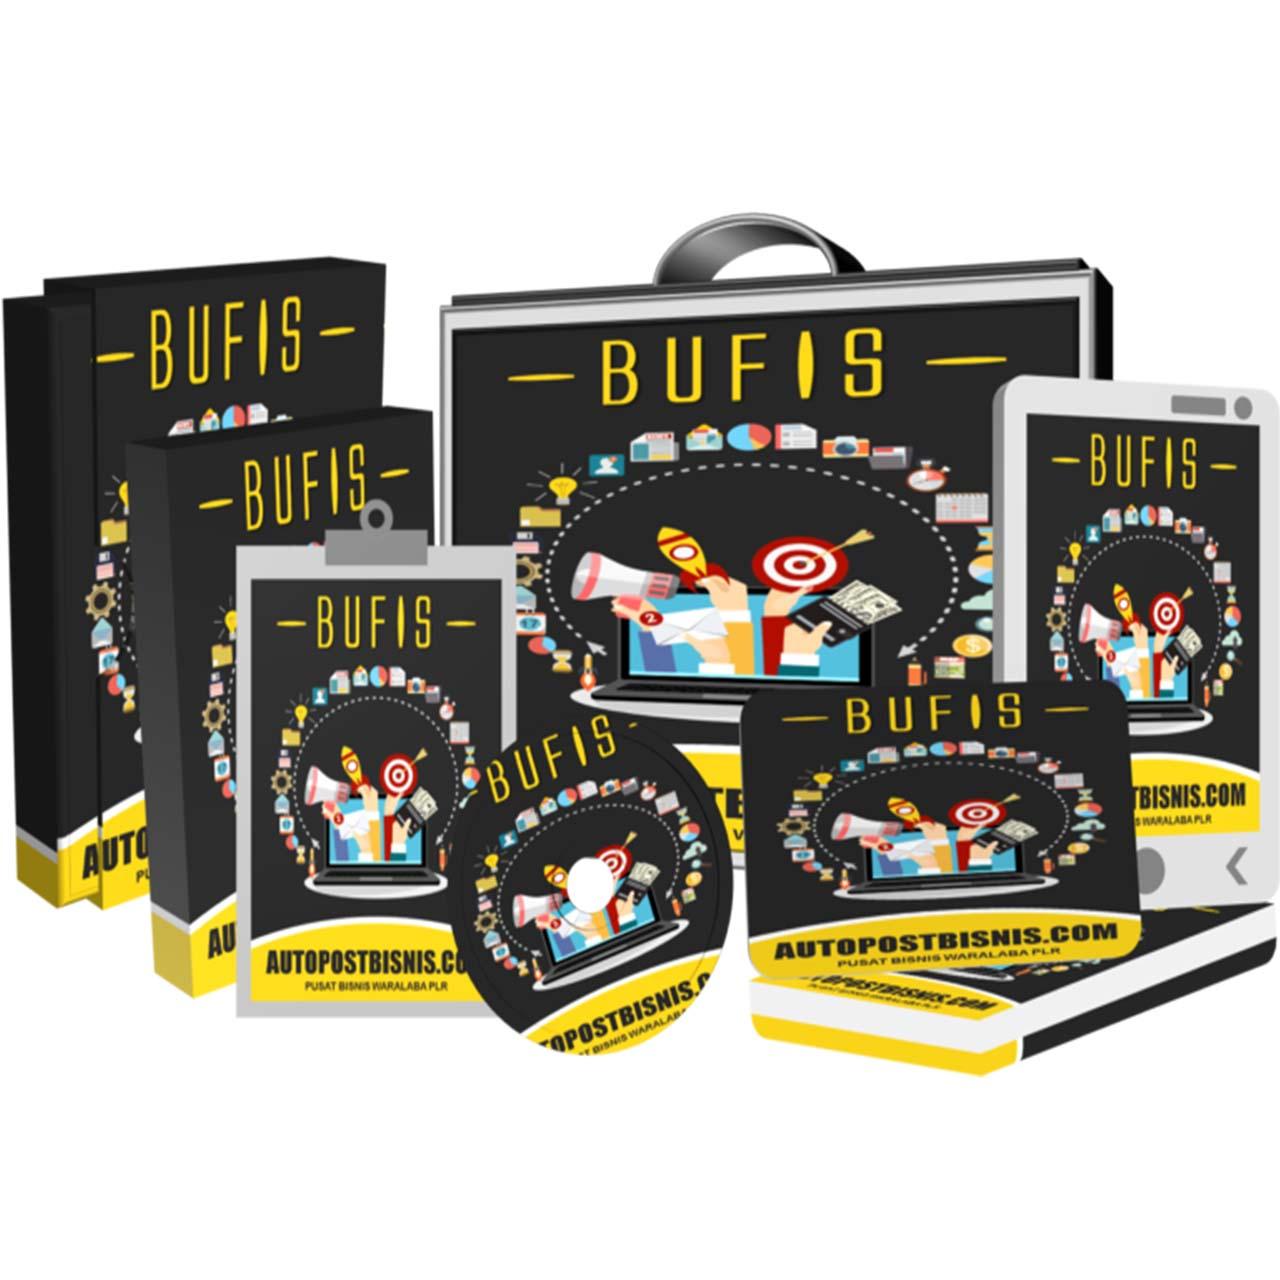 BUFIS - Bundel Grafis